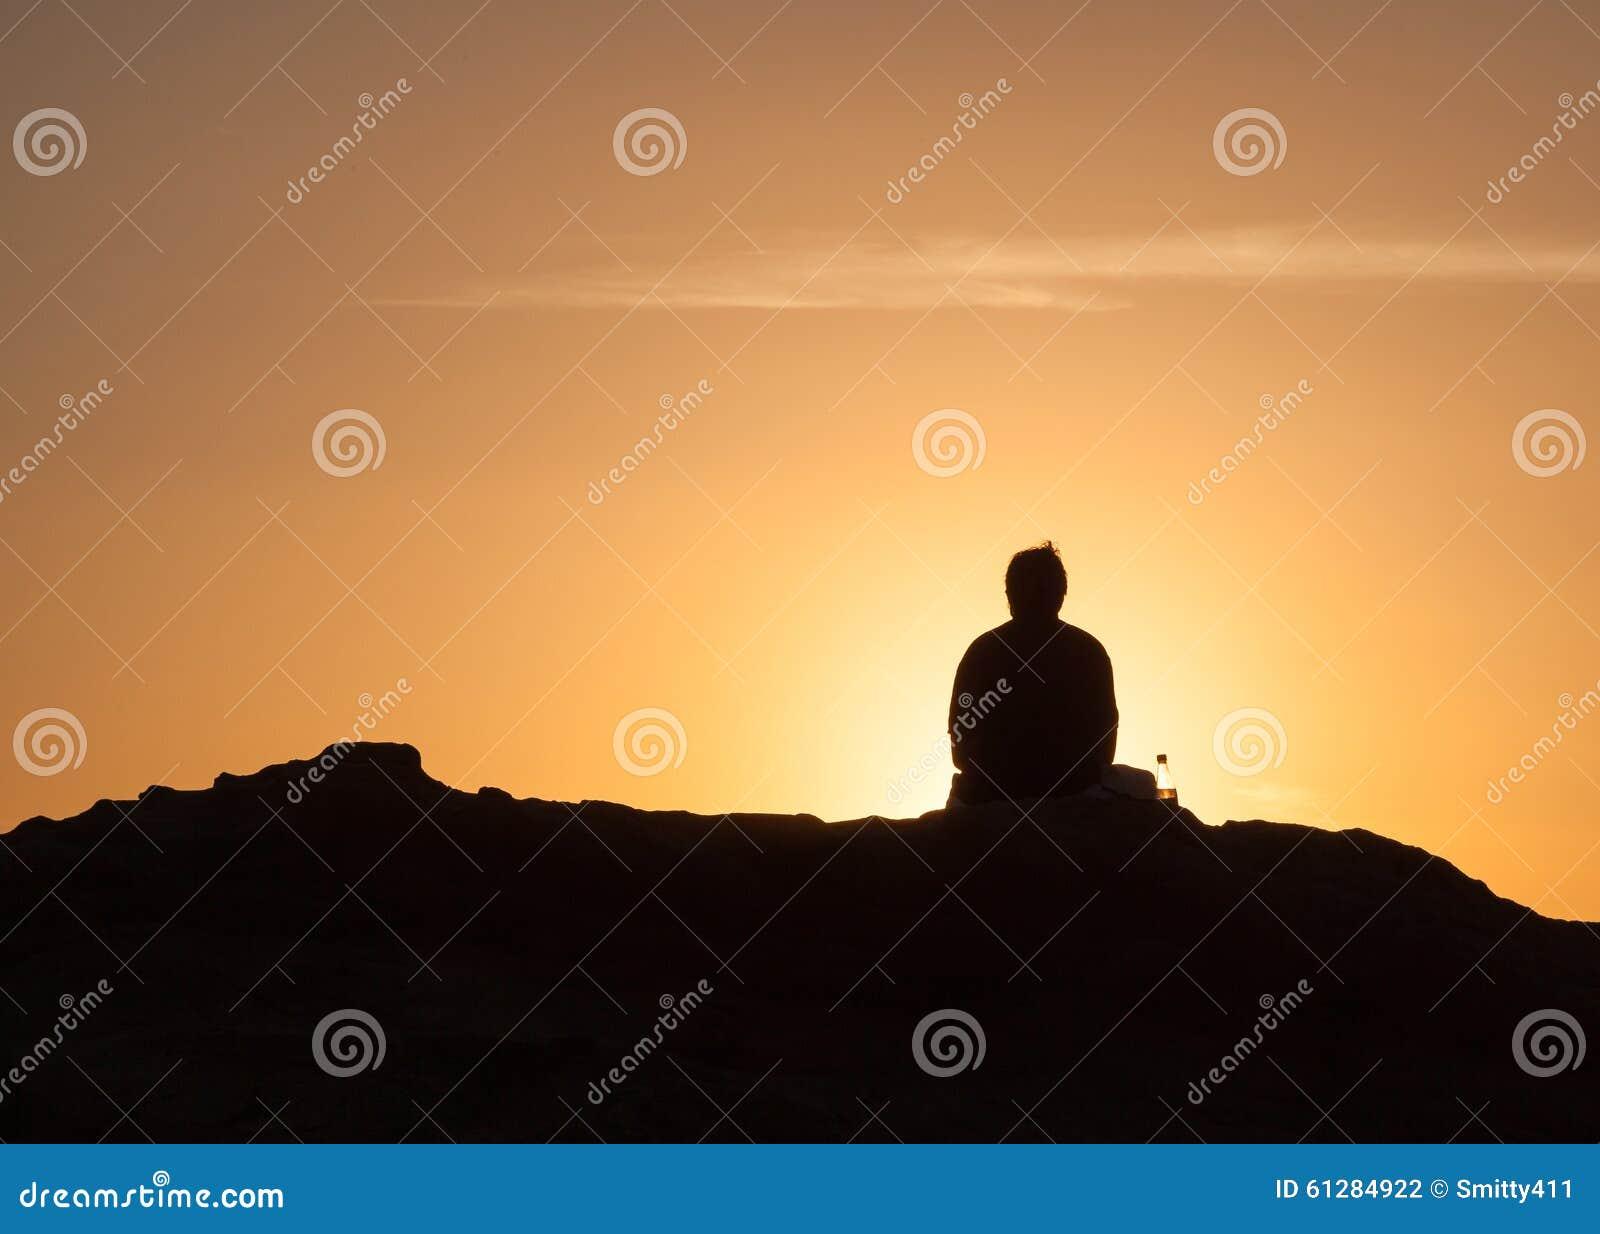 Lonely man at sunset in Laguna Beach